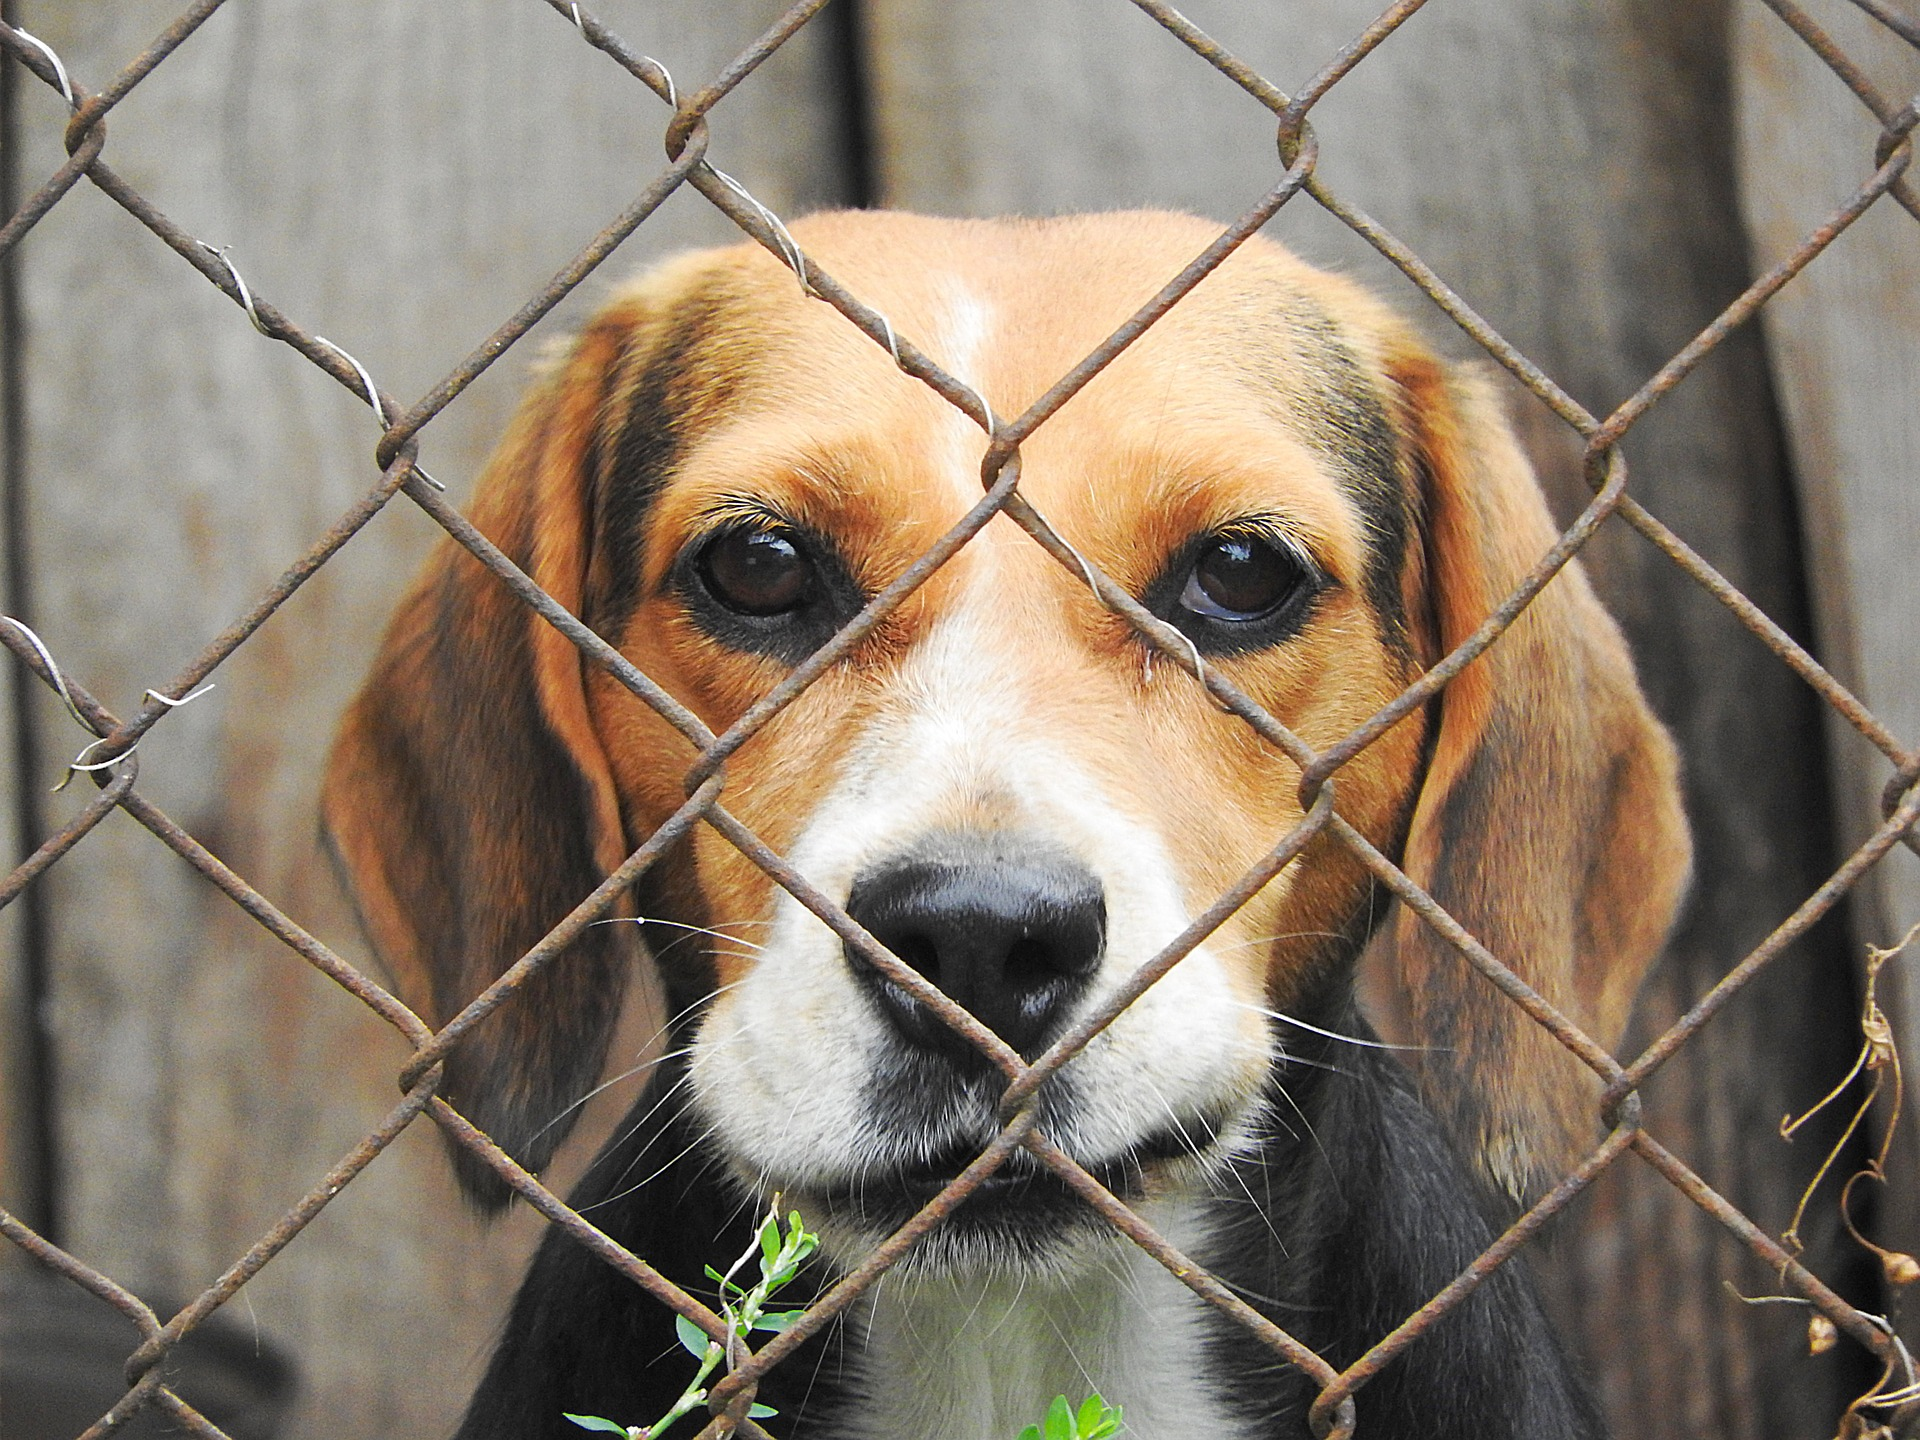 Dog slaughterhouse closed down